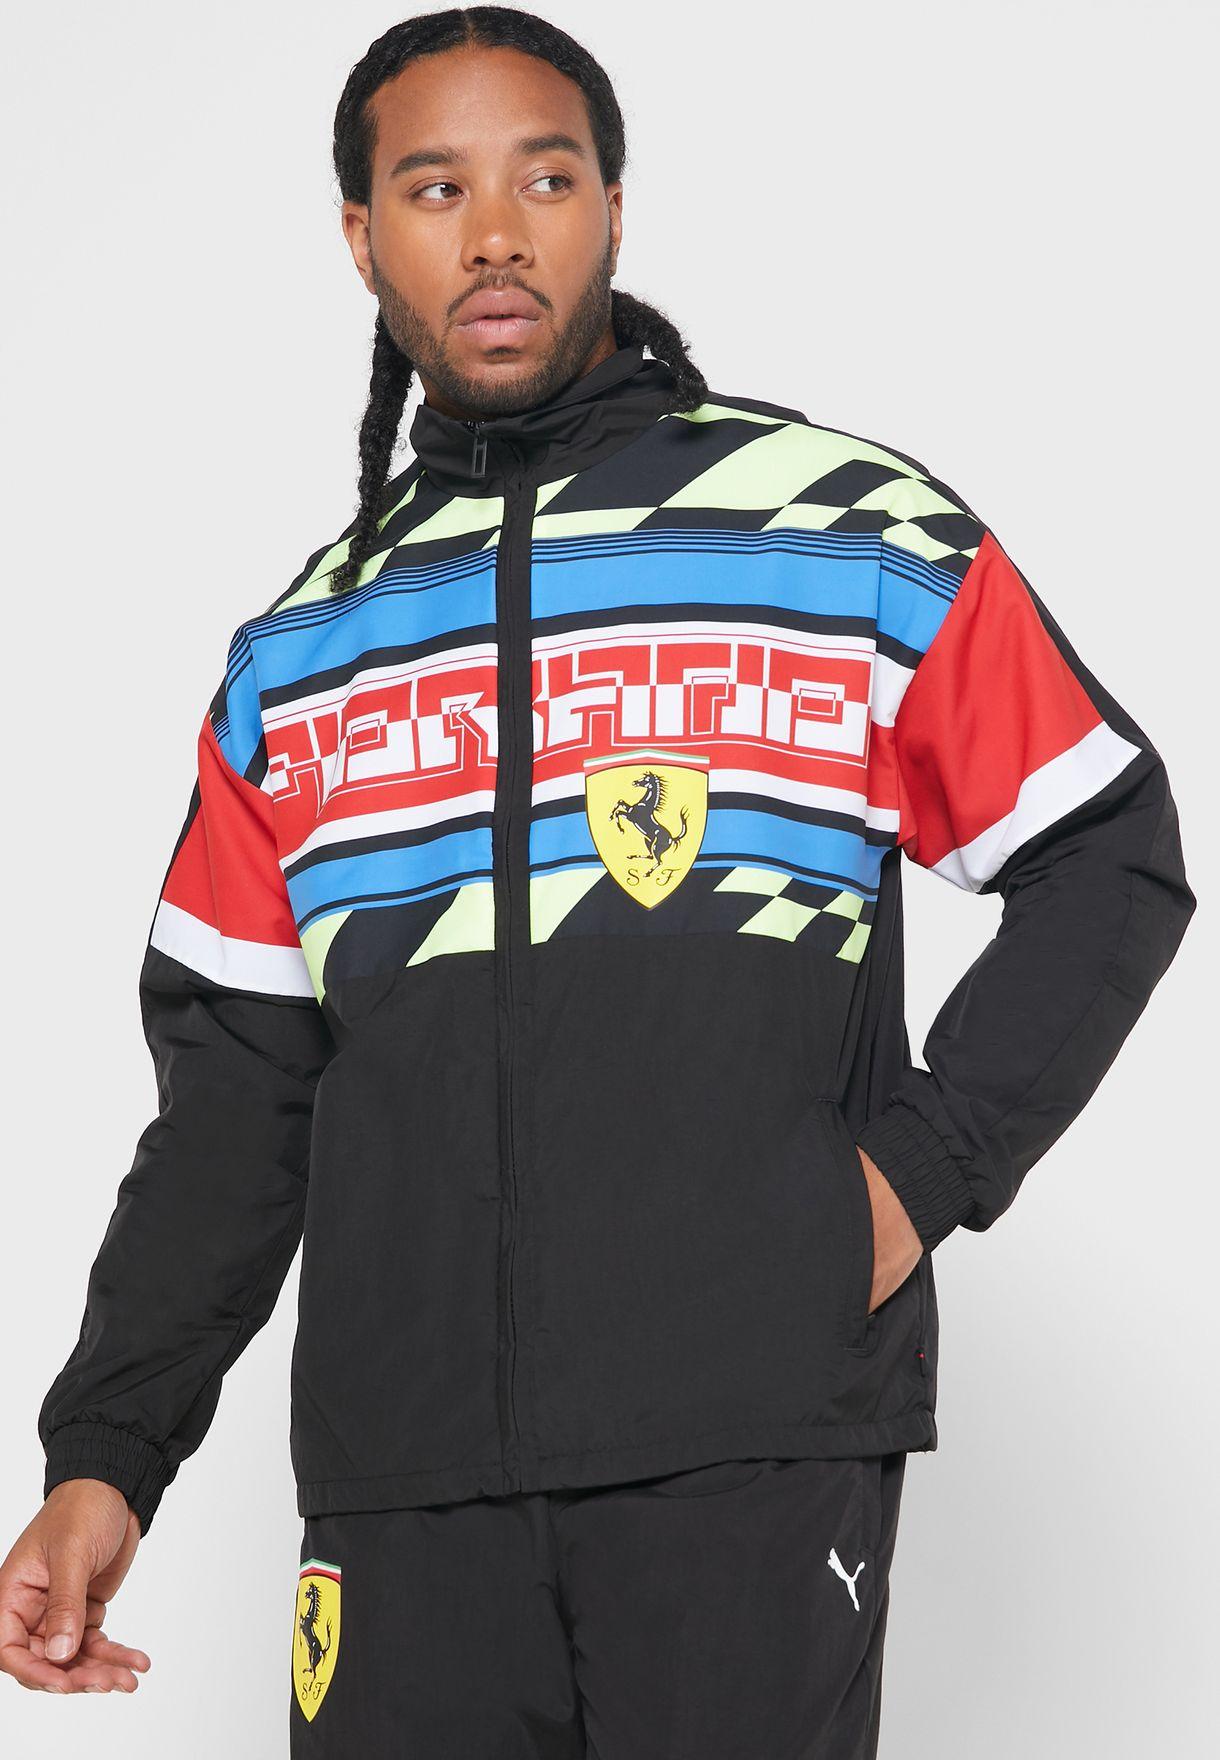 Buy Puma Multicolor Ferrari Street Jacket For Men In Muscat Other Cities 59613702